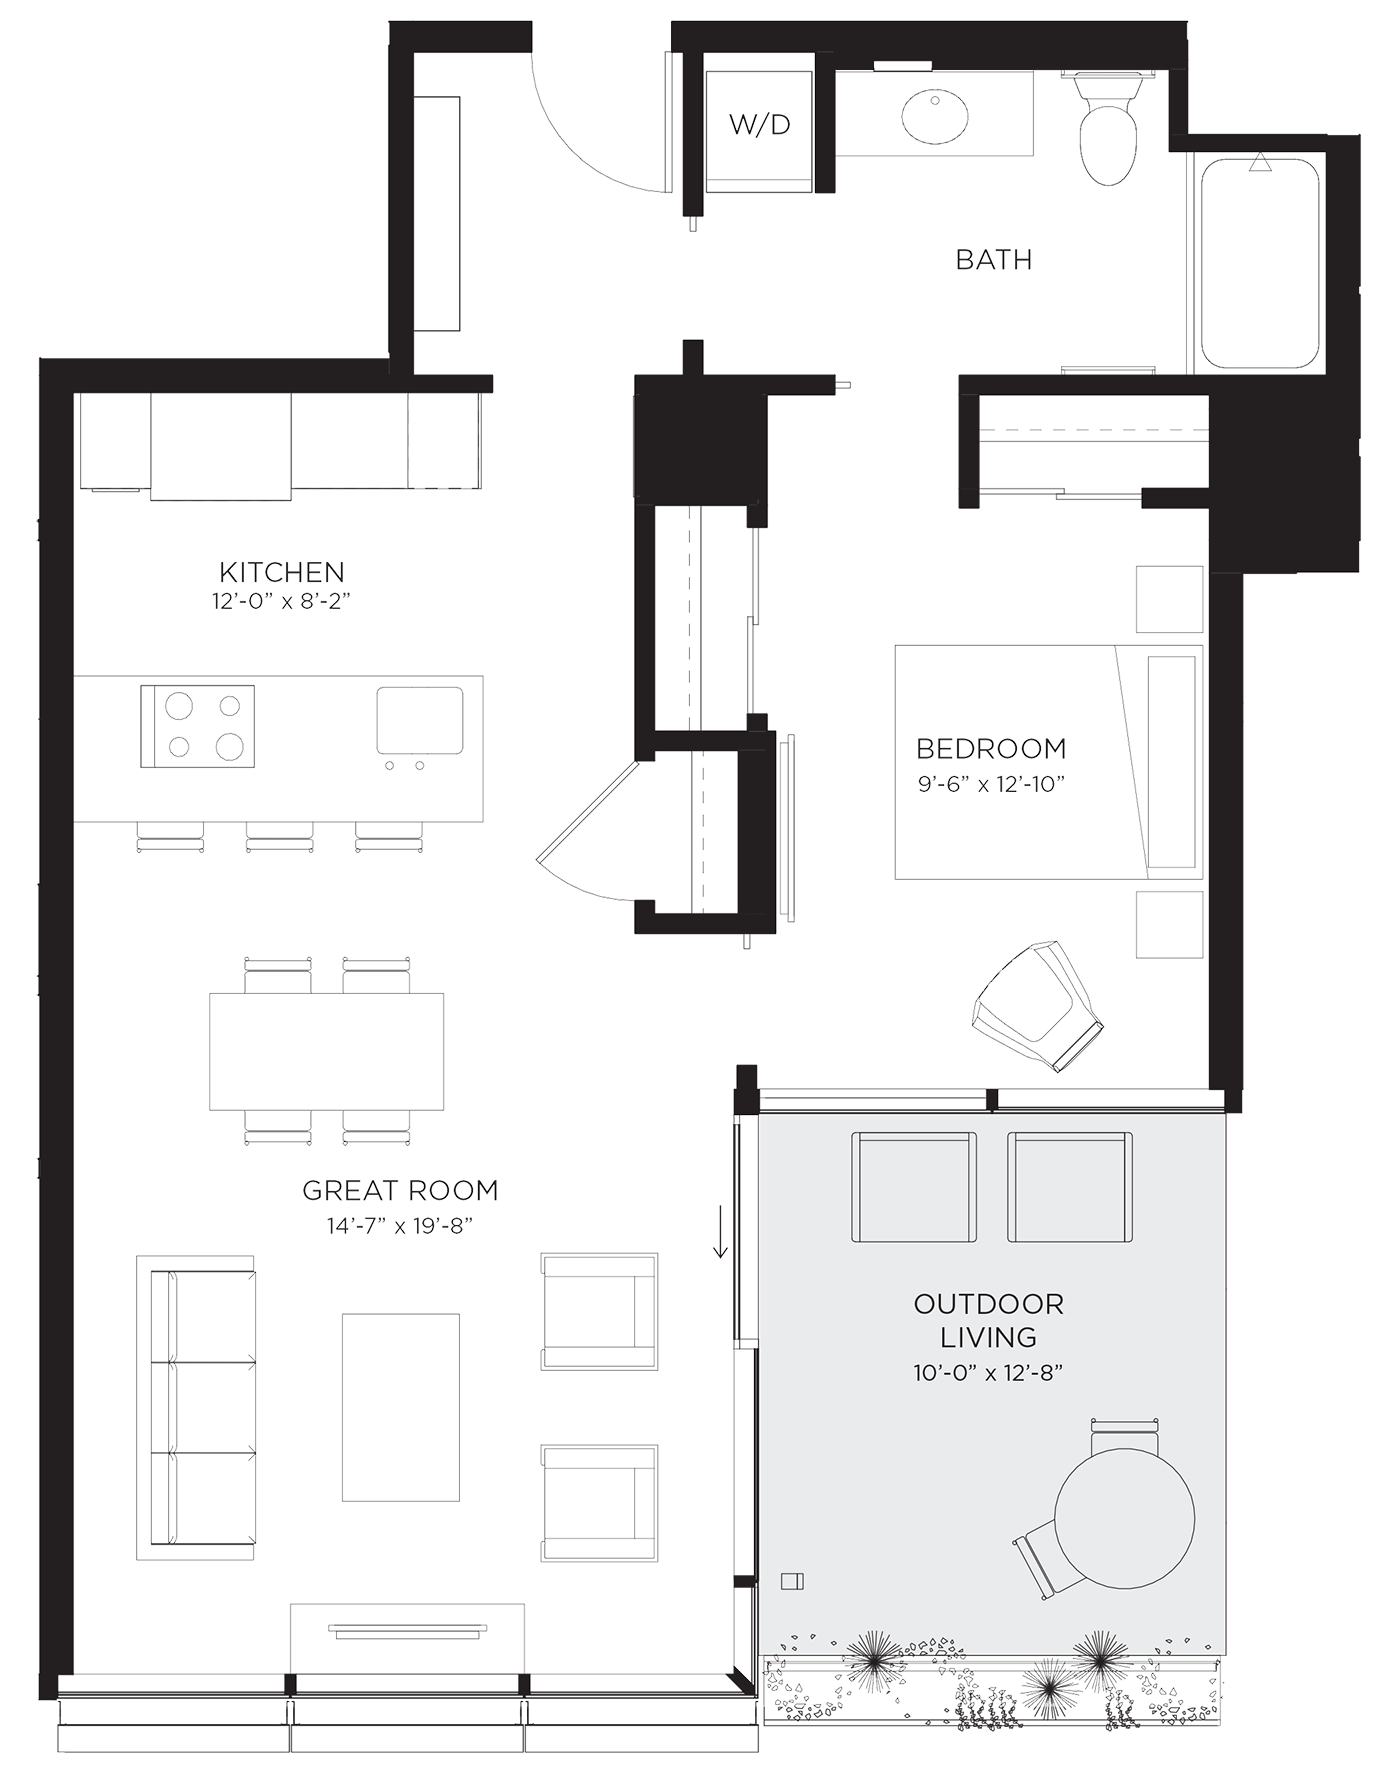 Unit 01K Floor Plan